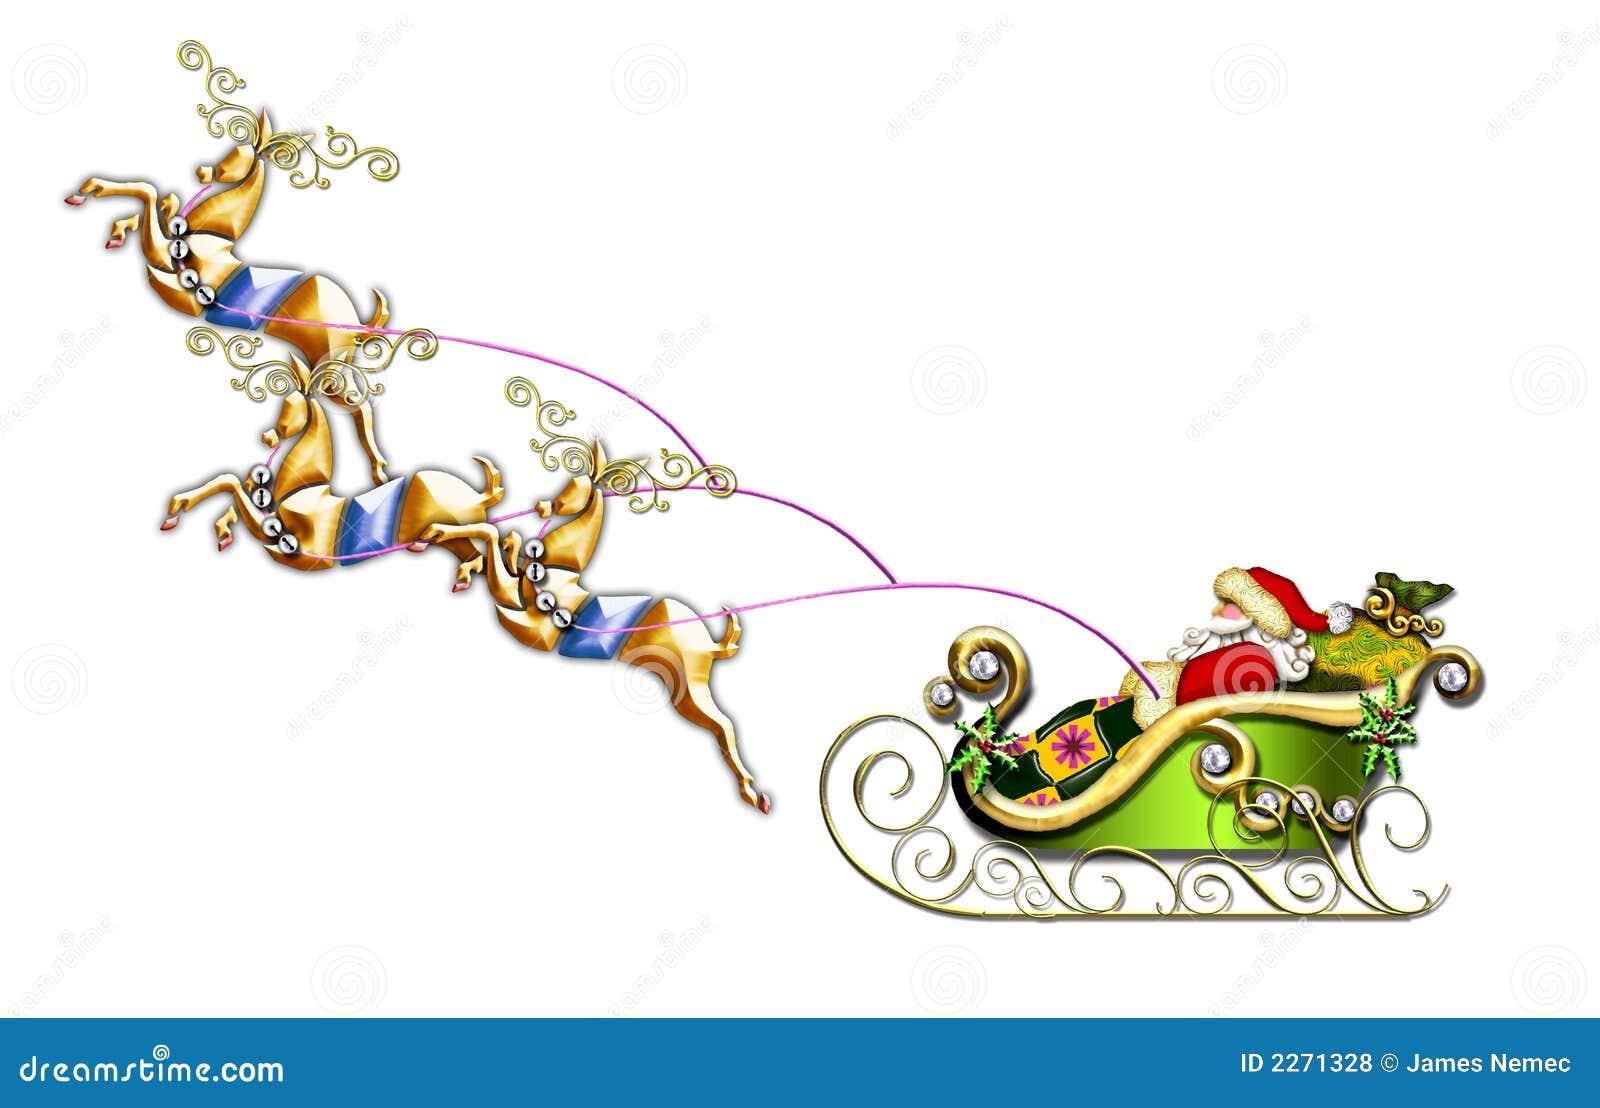 Volo della Santa